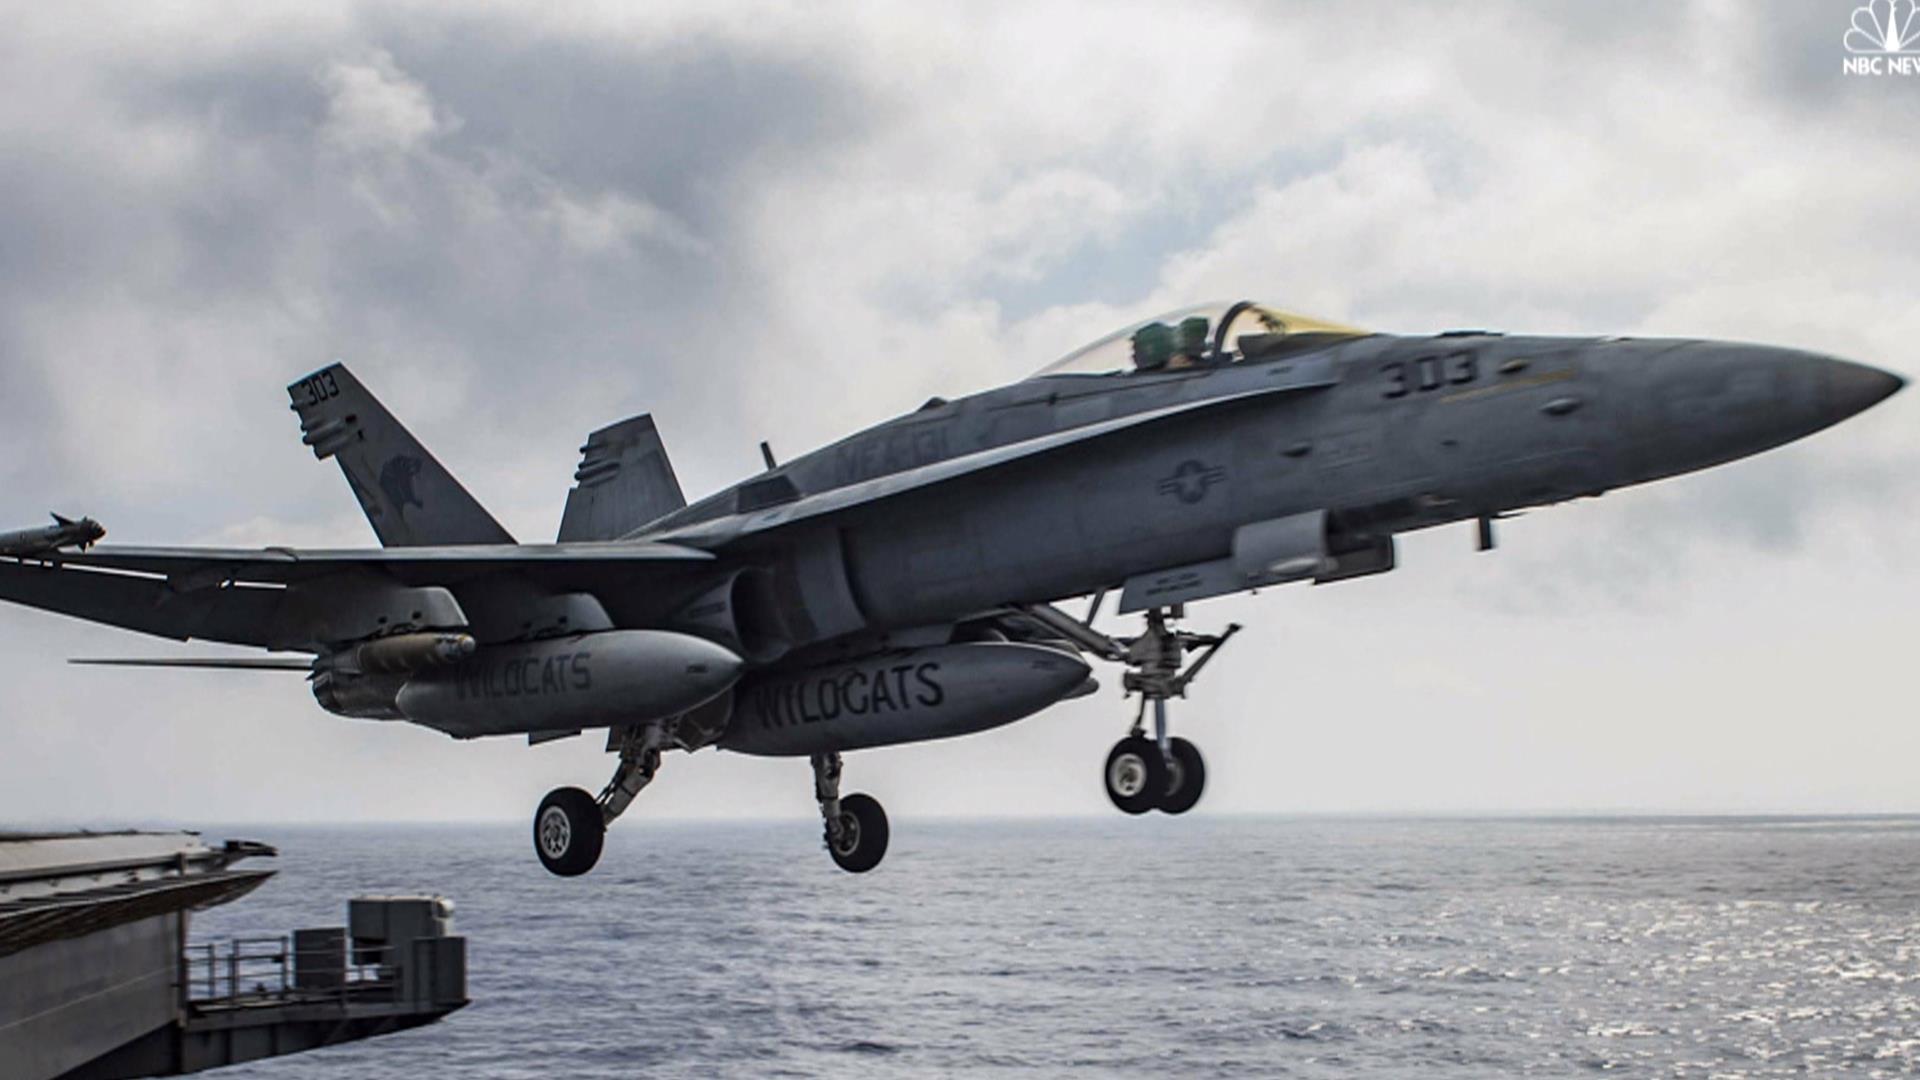 U.S. Aircraft Carrier Begins ISIS Strikes